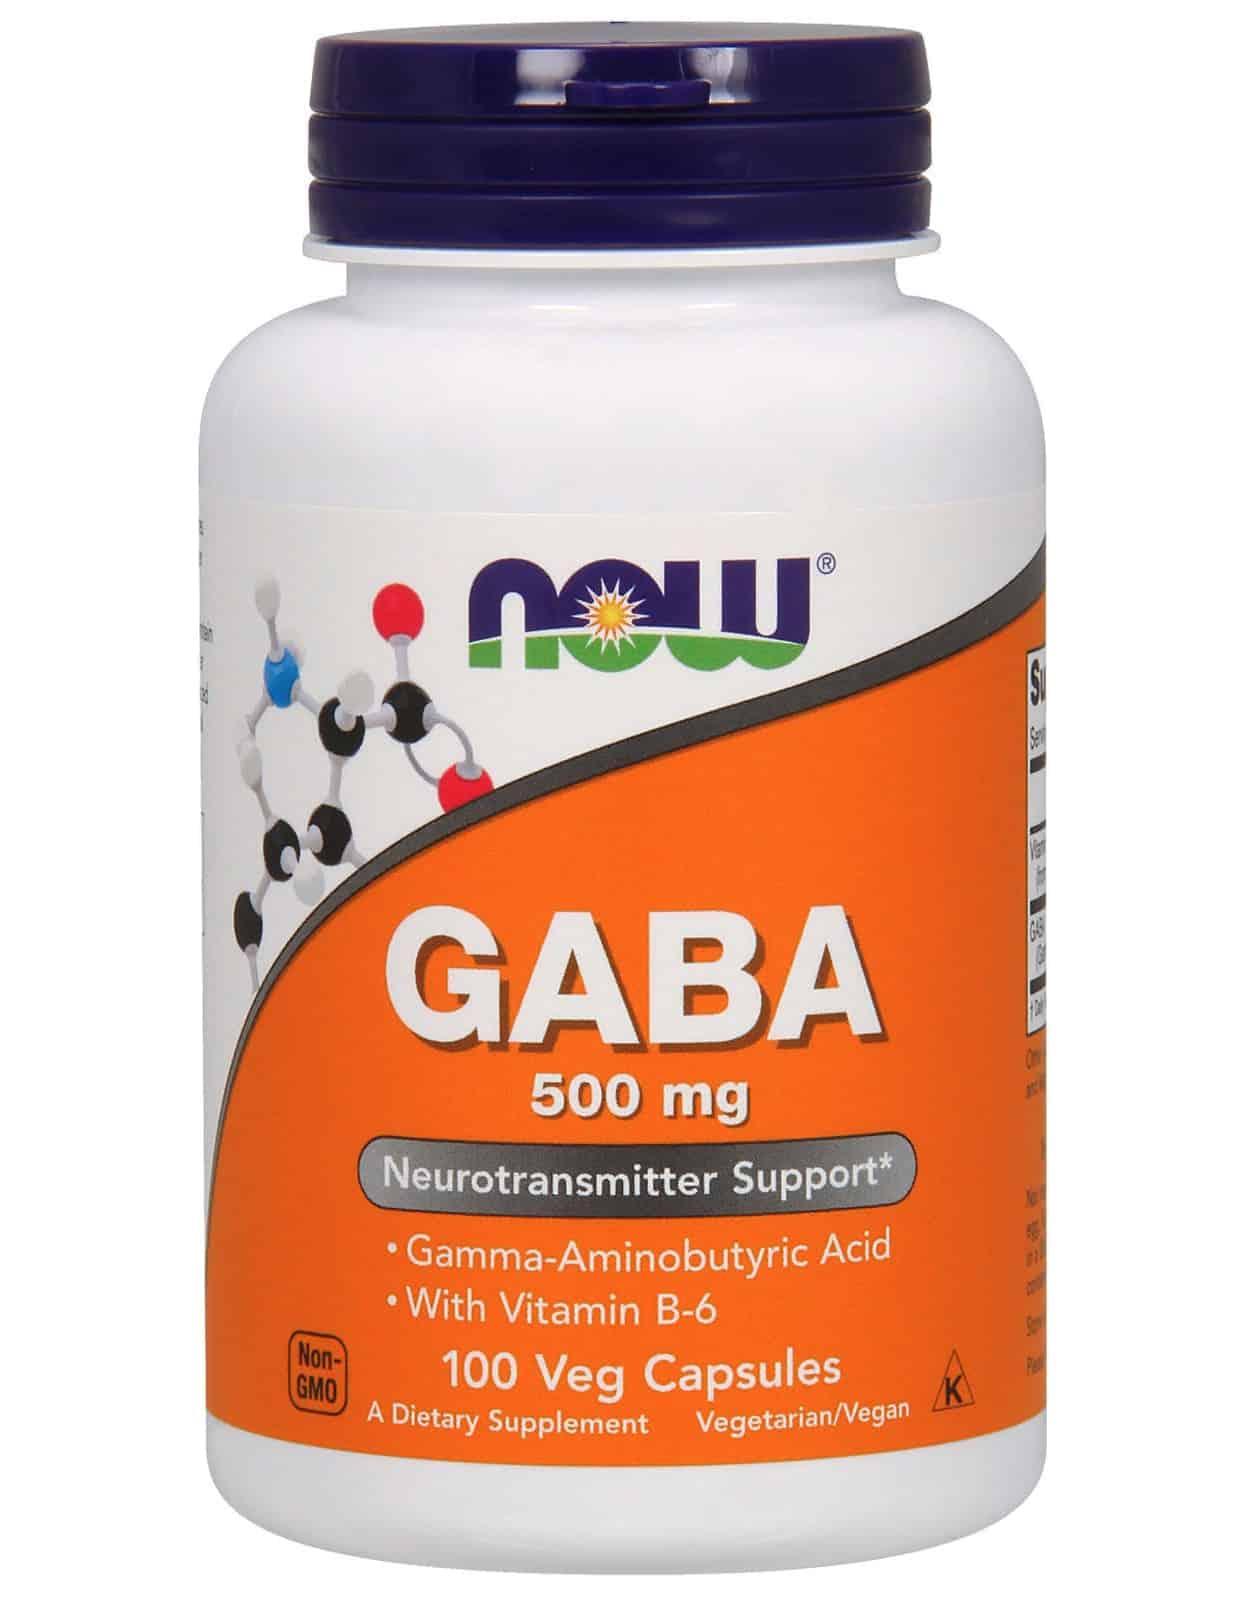 Формы выпуска GABA